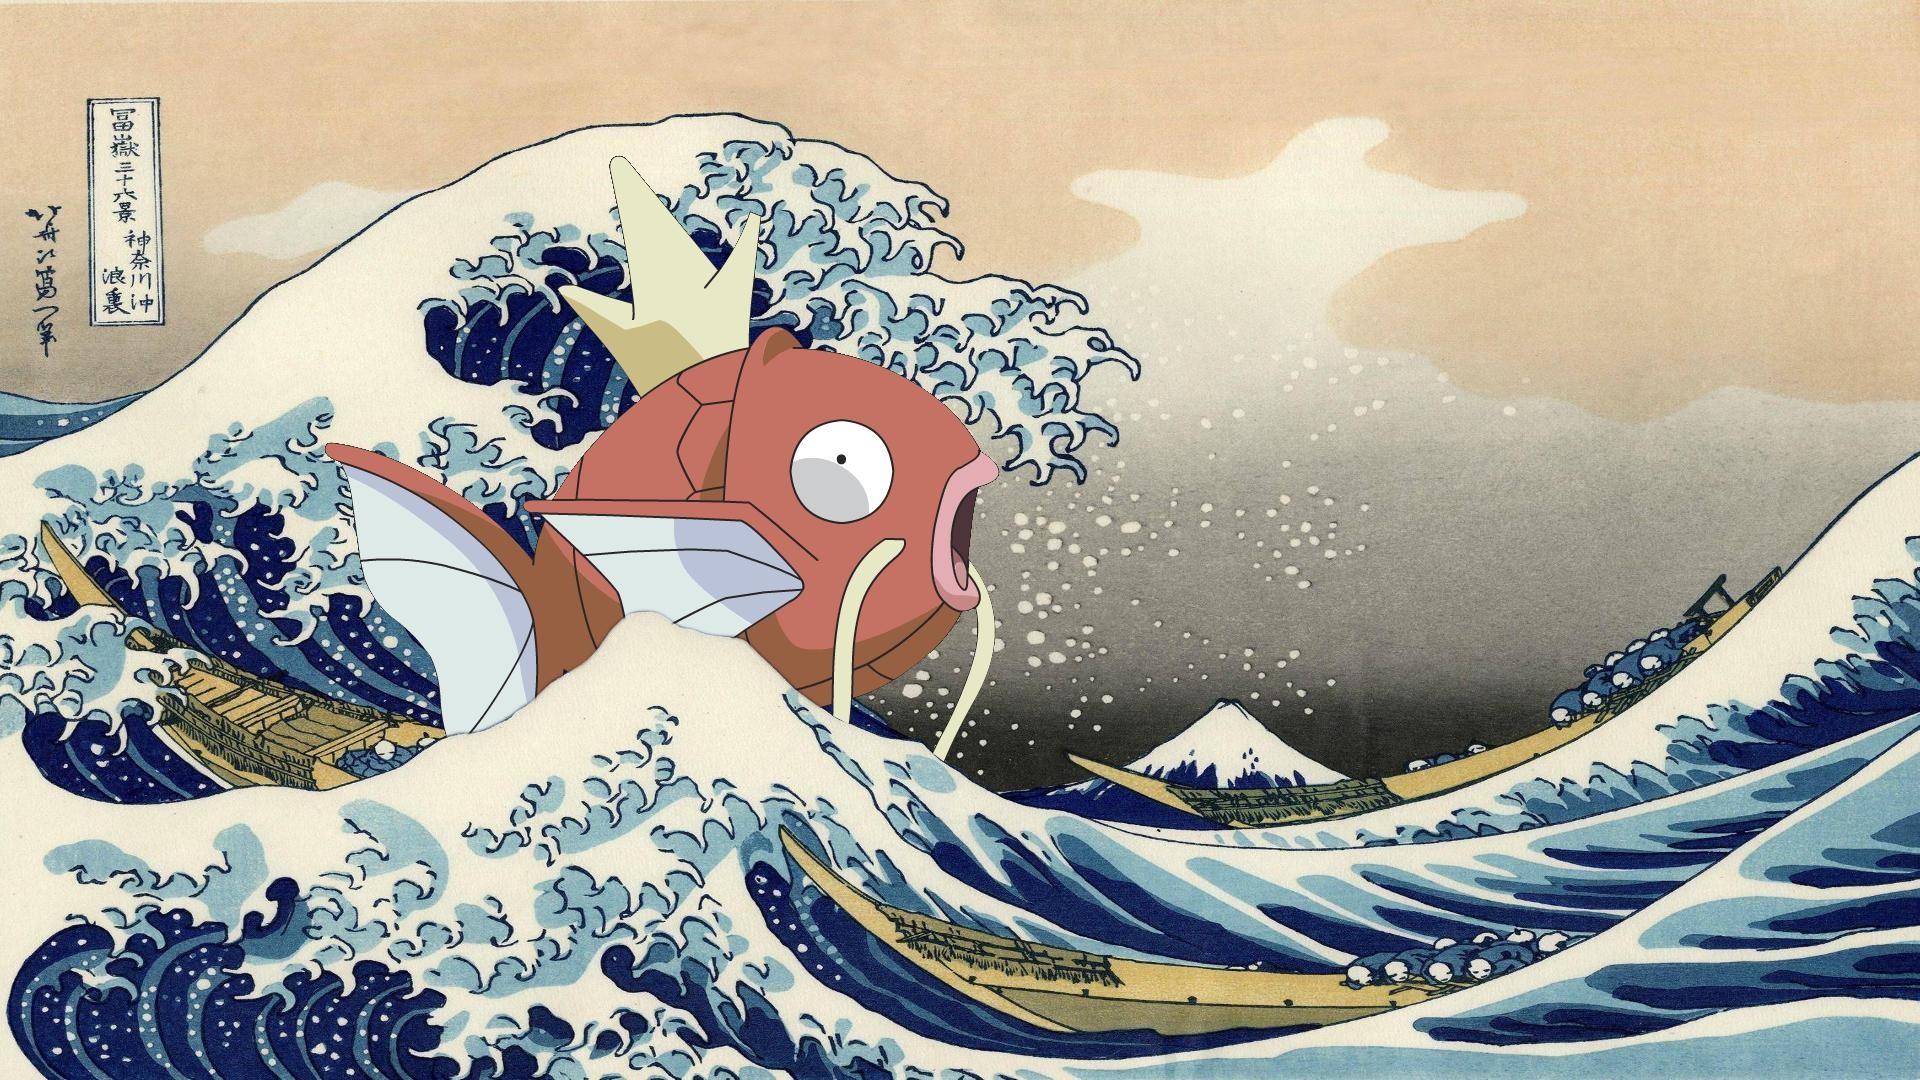 The Great Wave Off Kanagawa Hd Wallpaper The Great Wave Off Kanagawa Wallpaper 183 ①